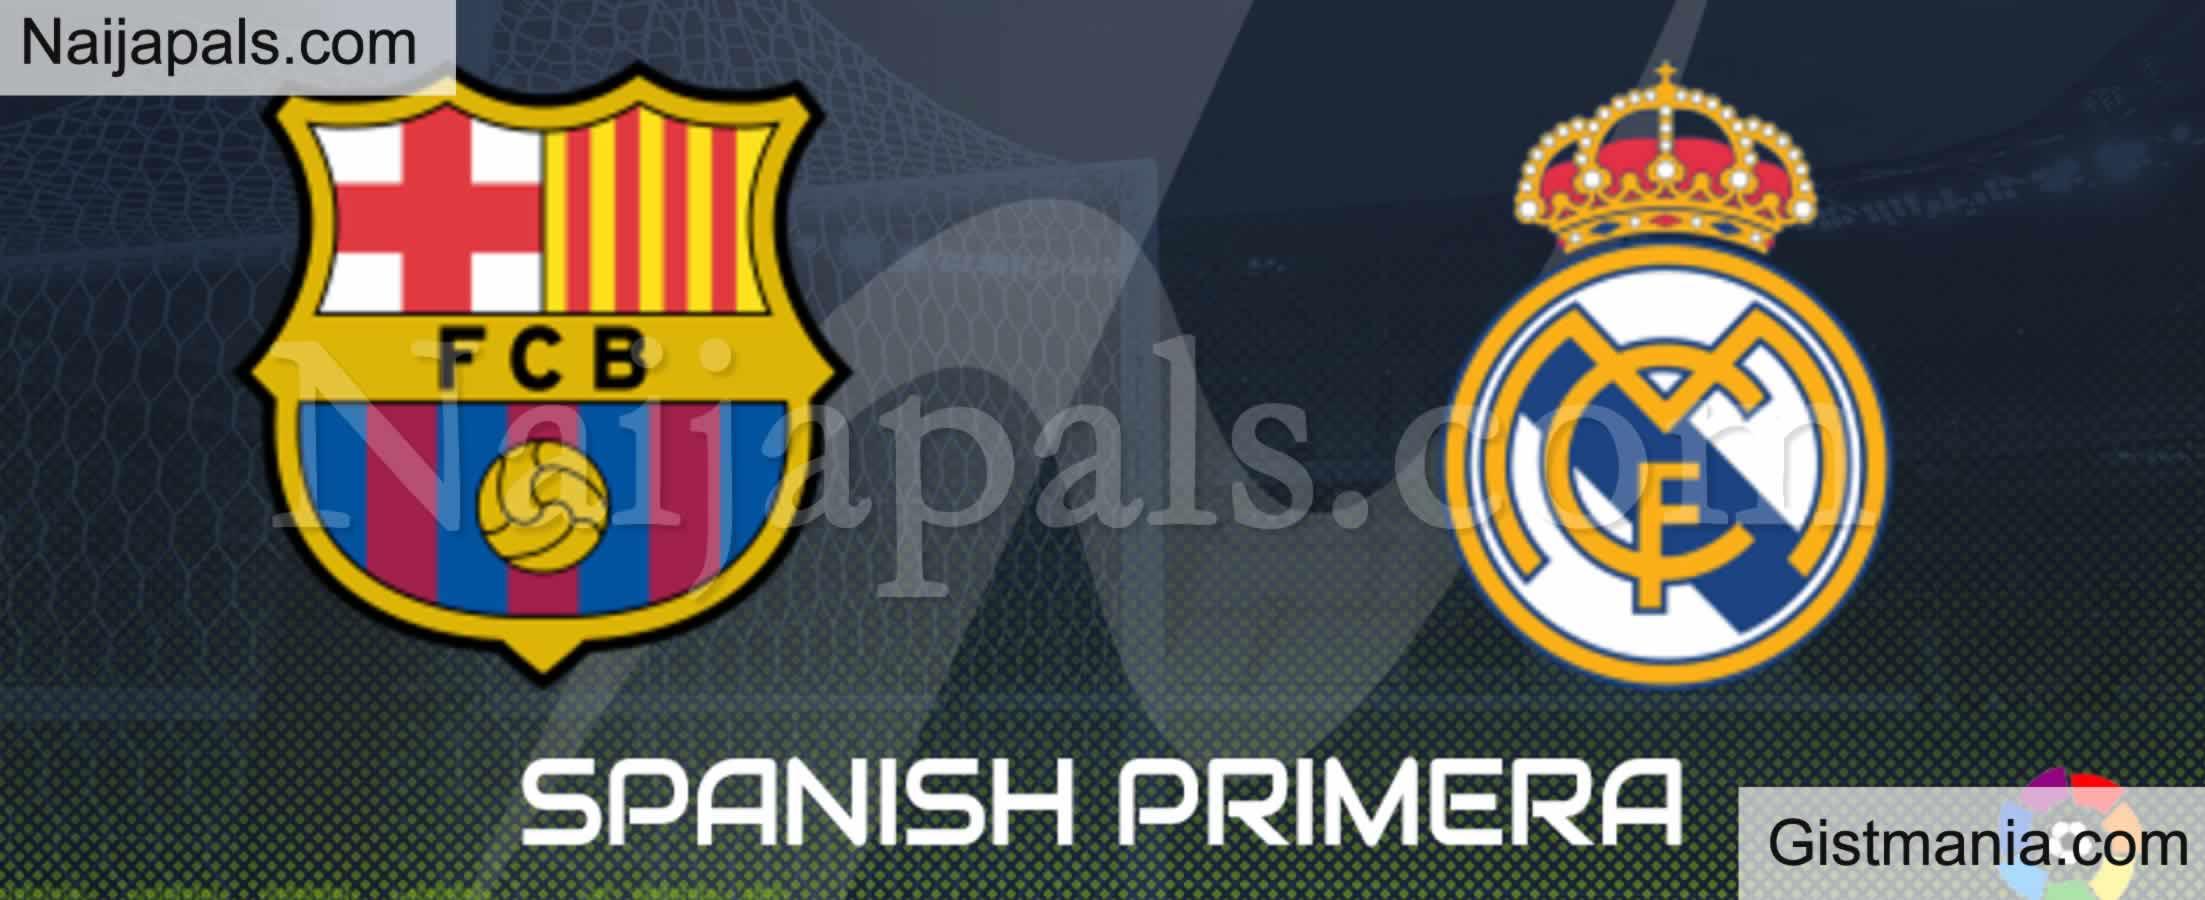 <img alt='.' class='lazyload' data-src='https://img.gistmania.com/emot/soccer.gif' /> <b>Barcelona v Real Madrid : El-Classico La-Liga Match, Team News, Goal Scorers and Stats</b>